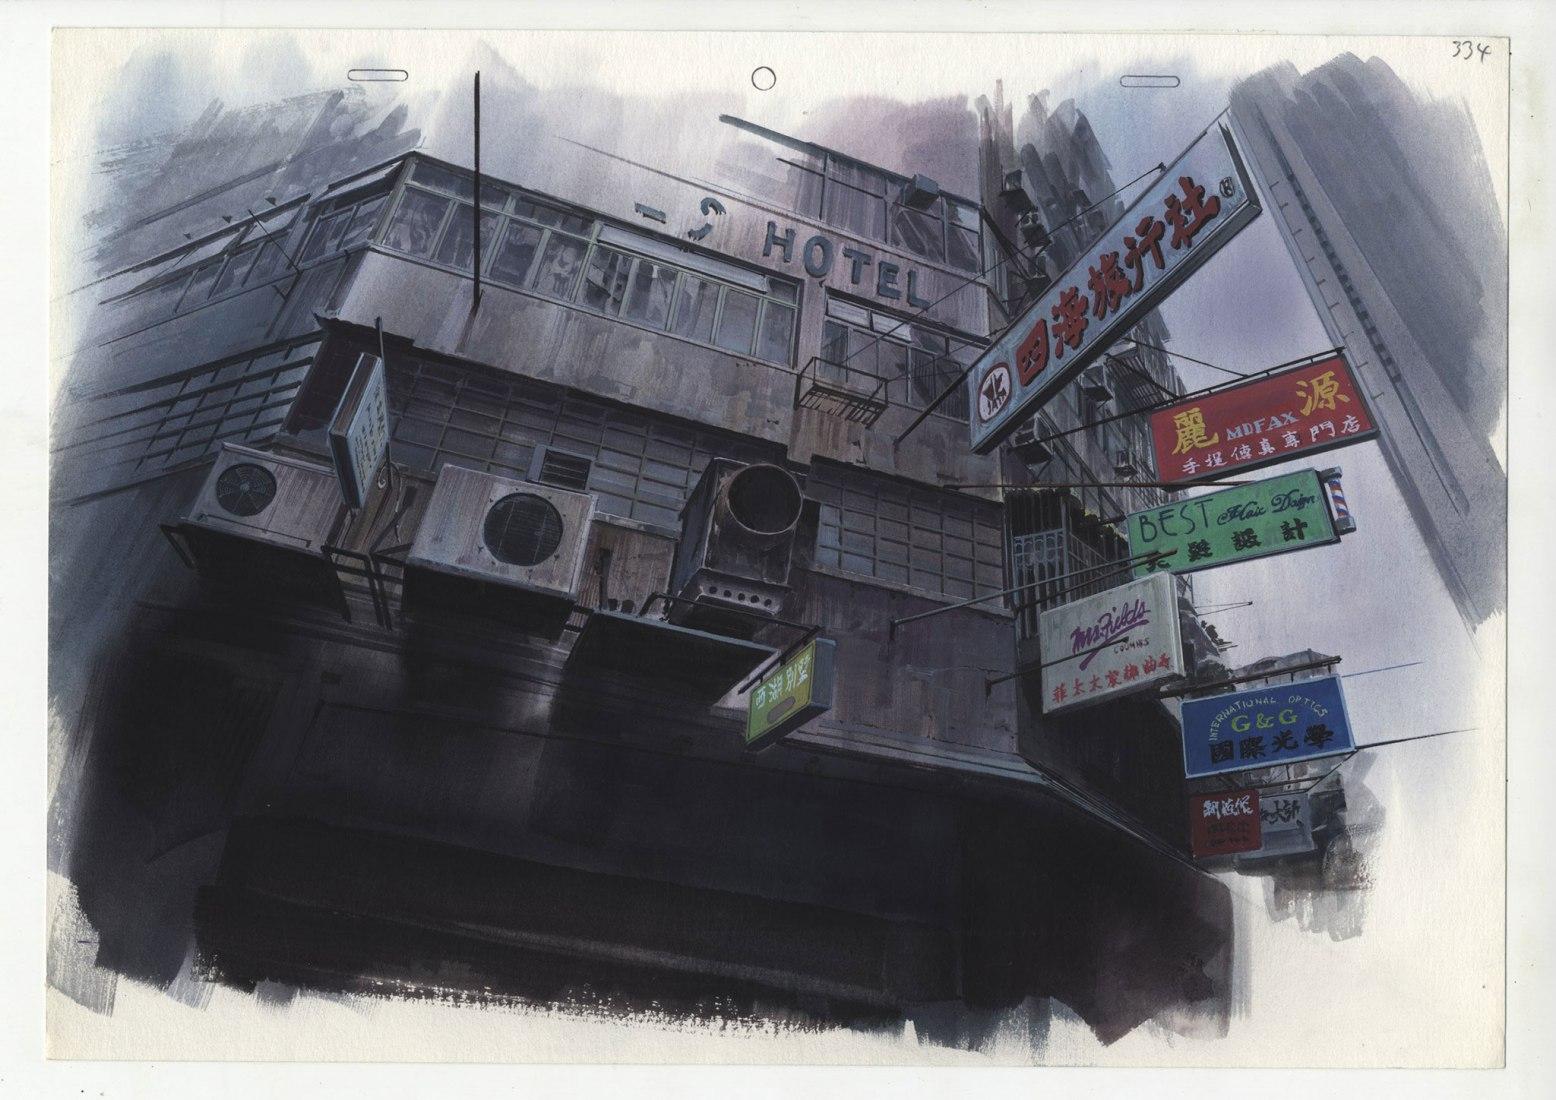 Ilustración de fondo para Ghost in the Shell de Hiromasa Ogura © 1995 Shirow Masamune / KODANSHA · BANDAI VISUAL · MANGA ENTERTAINMENT Ltd